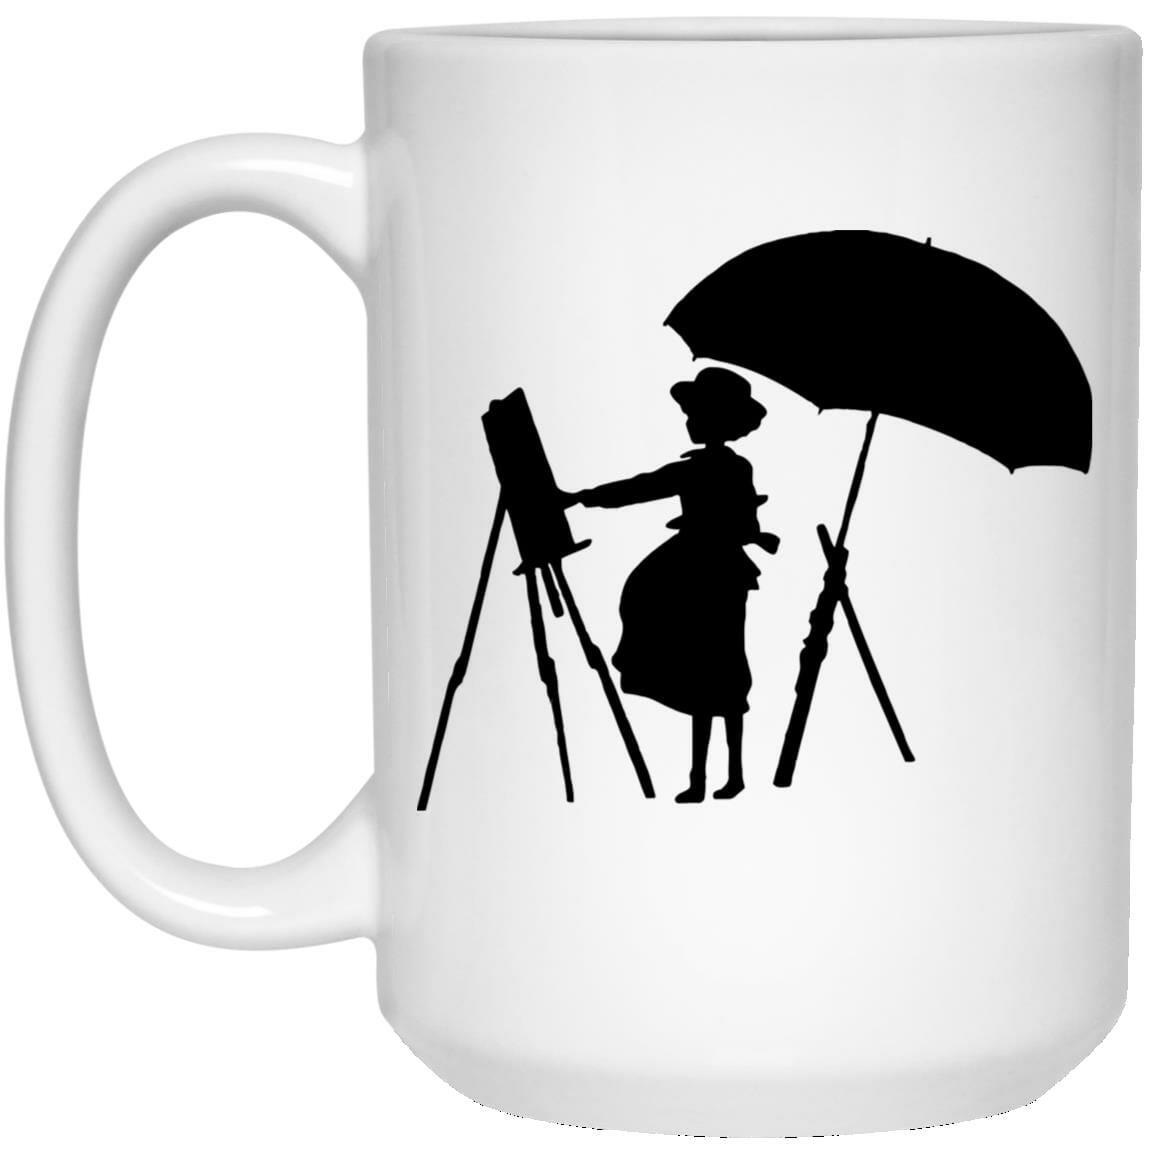 The Wind Rises Cutout Black & White Mug